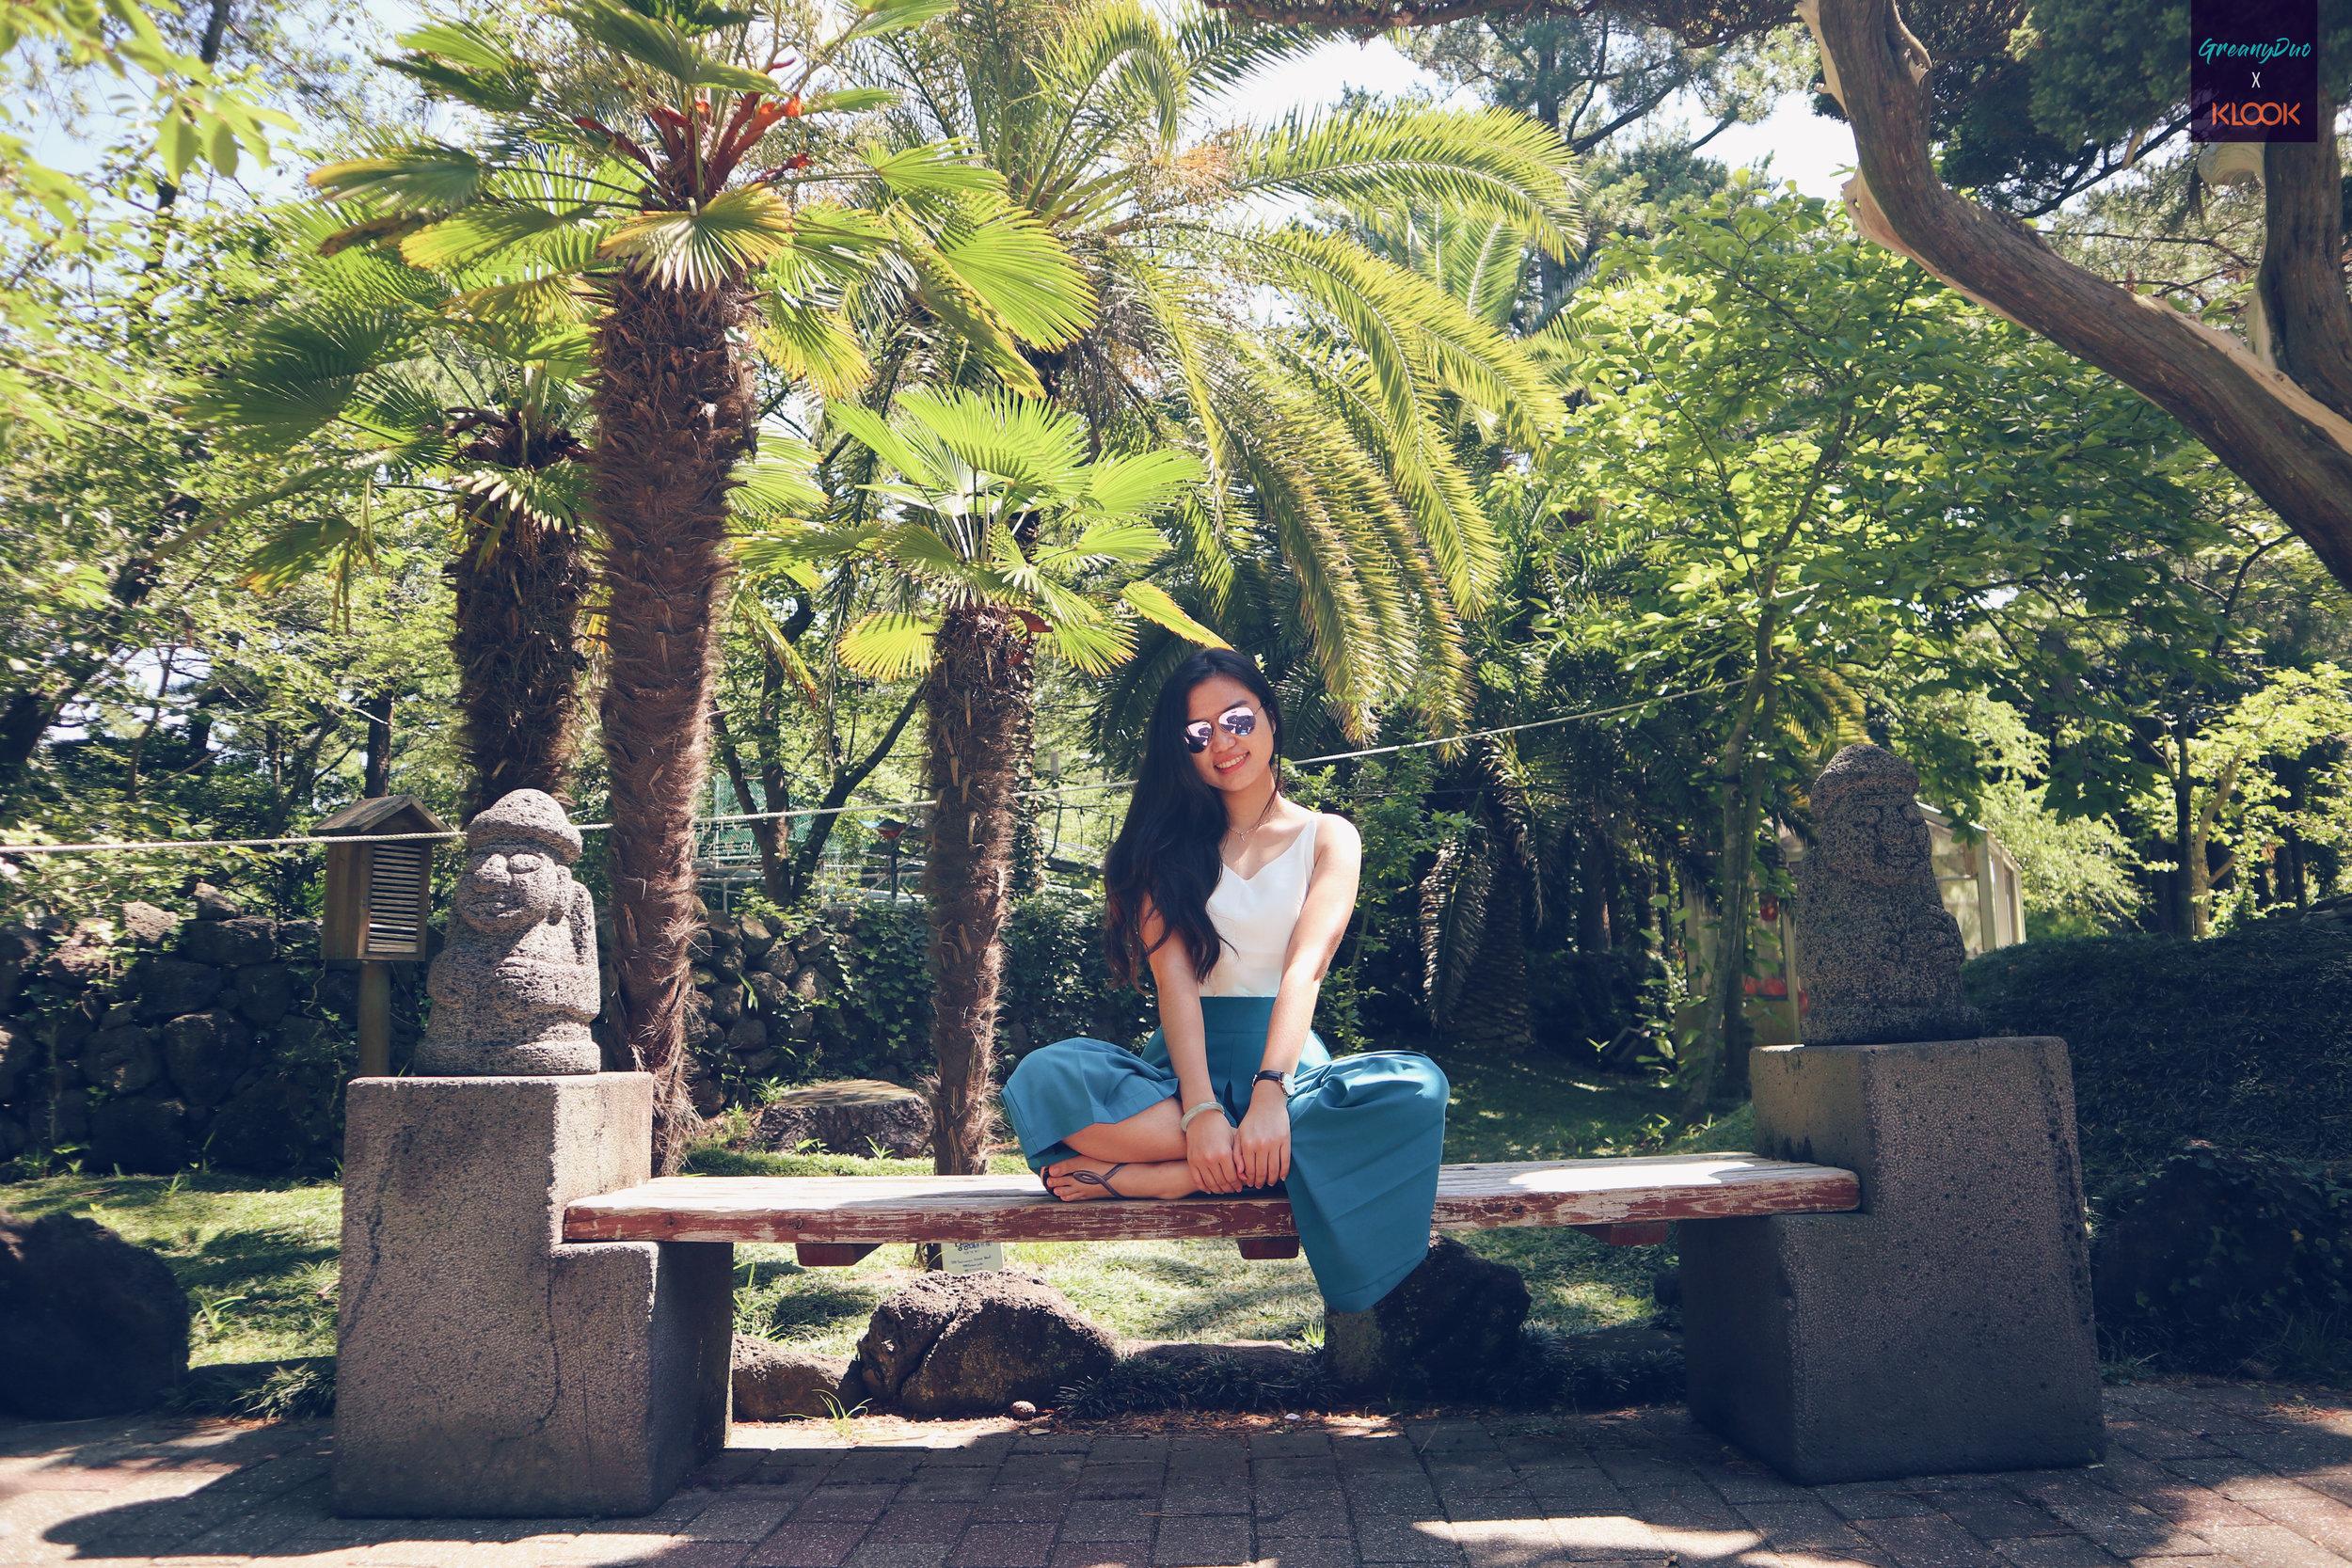 tina posting on a bench at hallim park, jeju